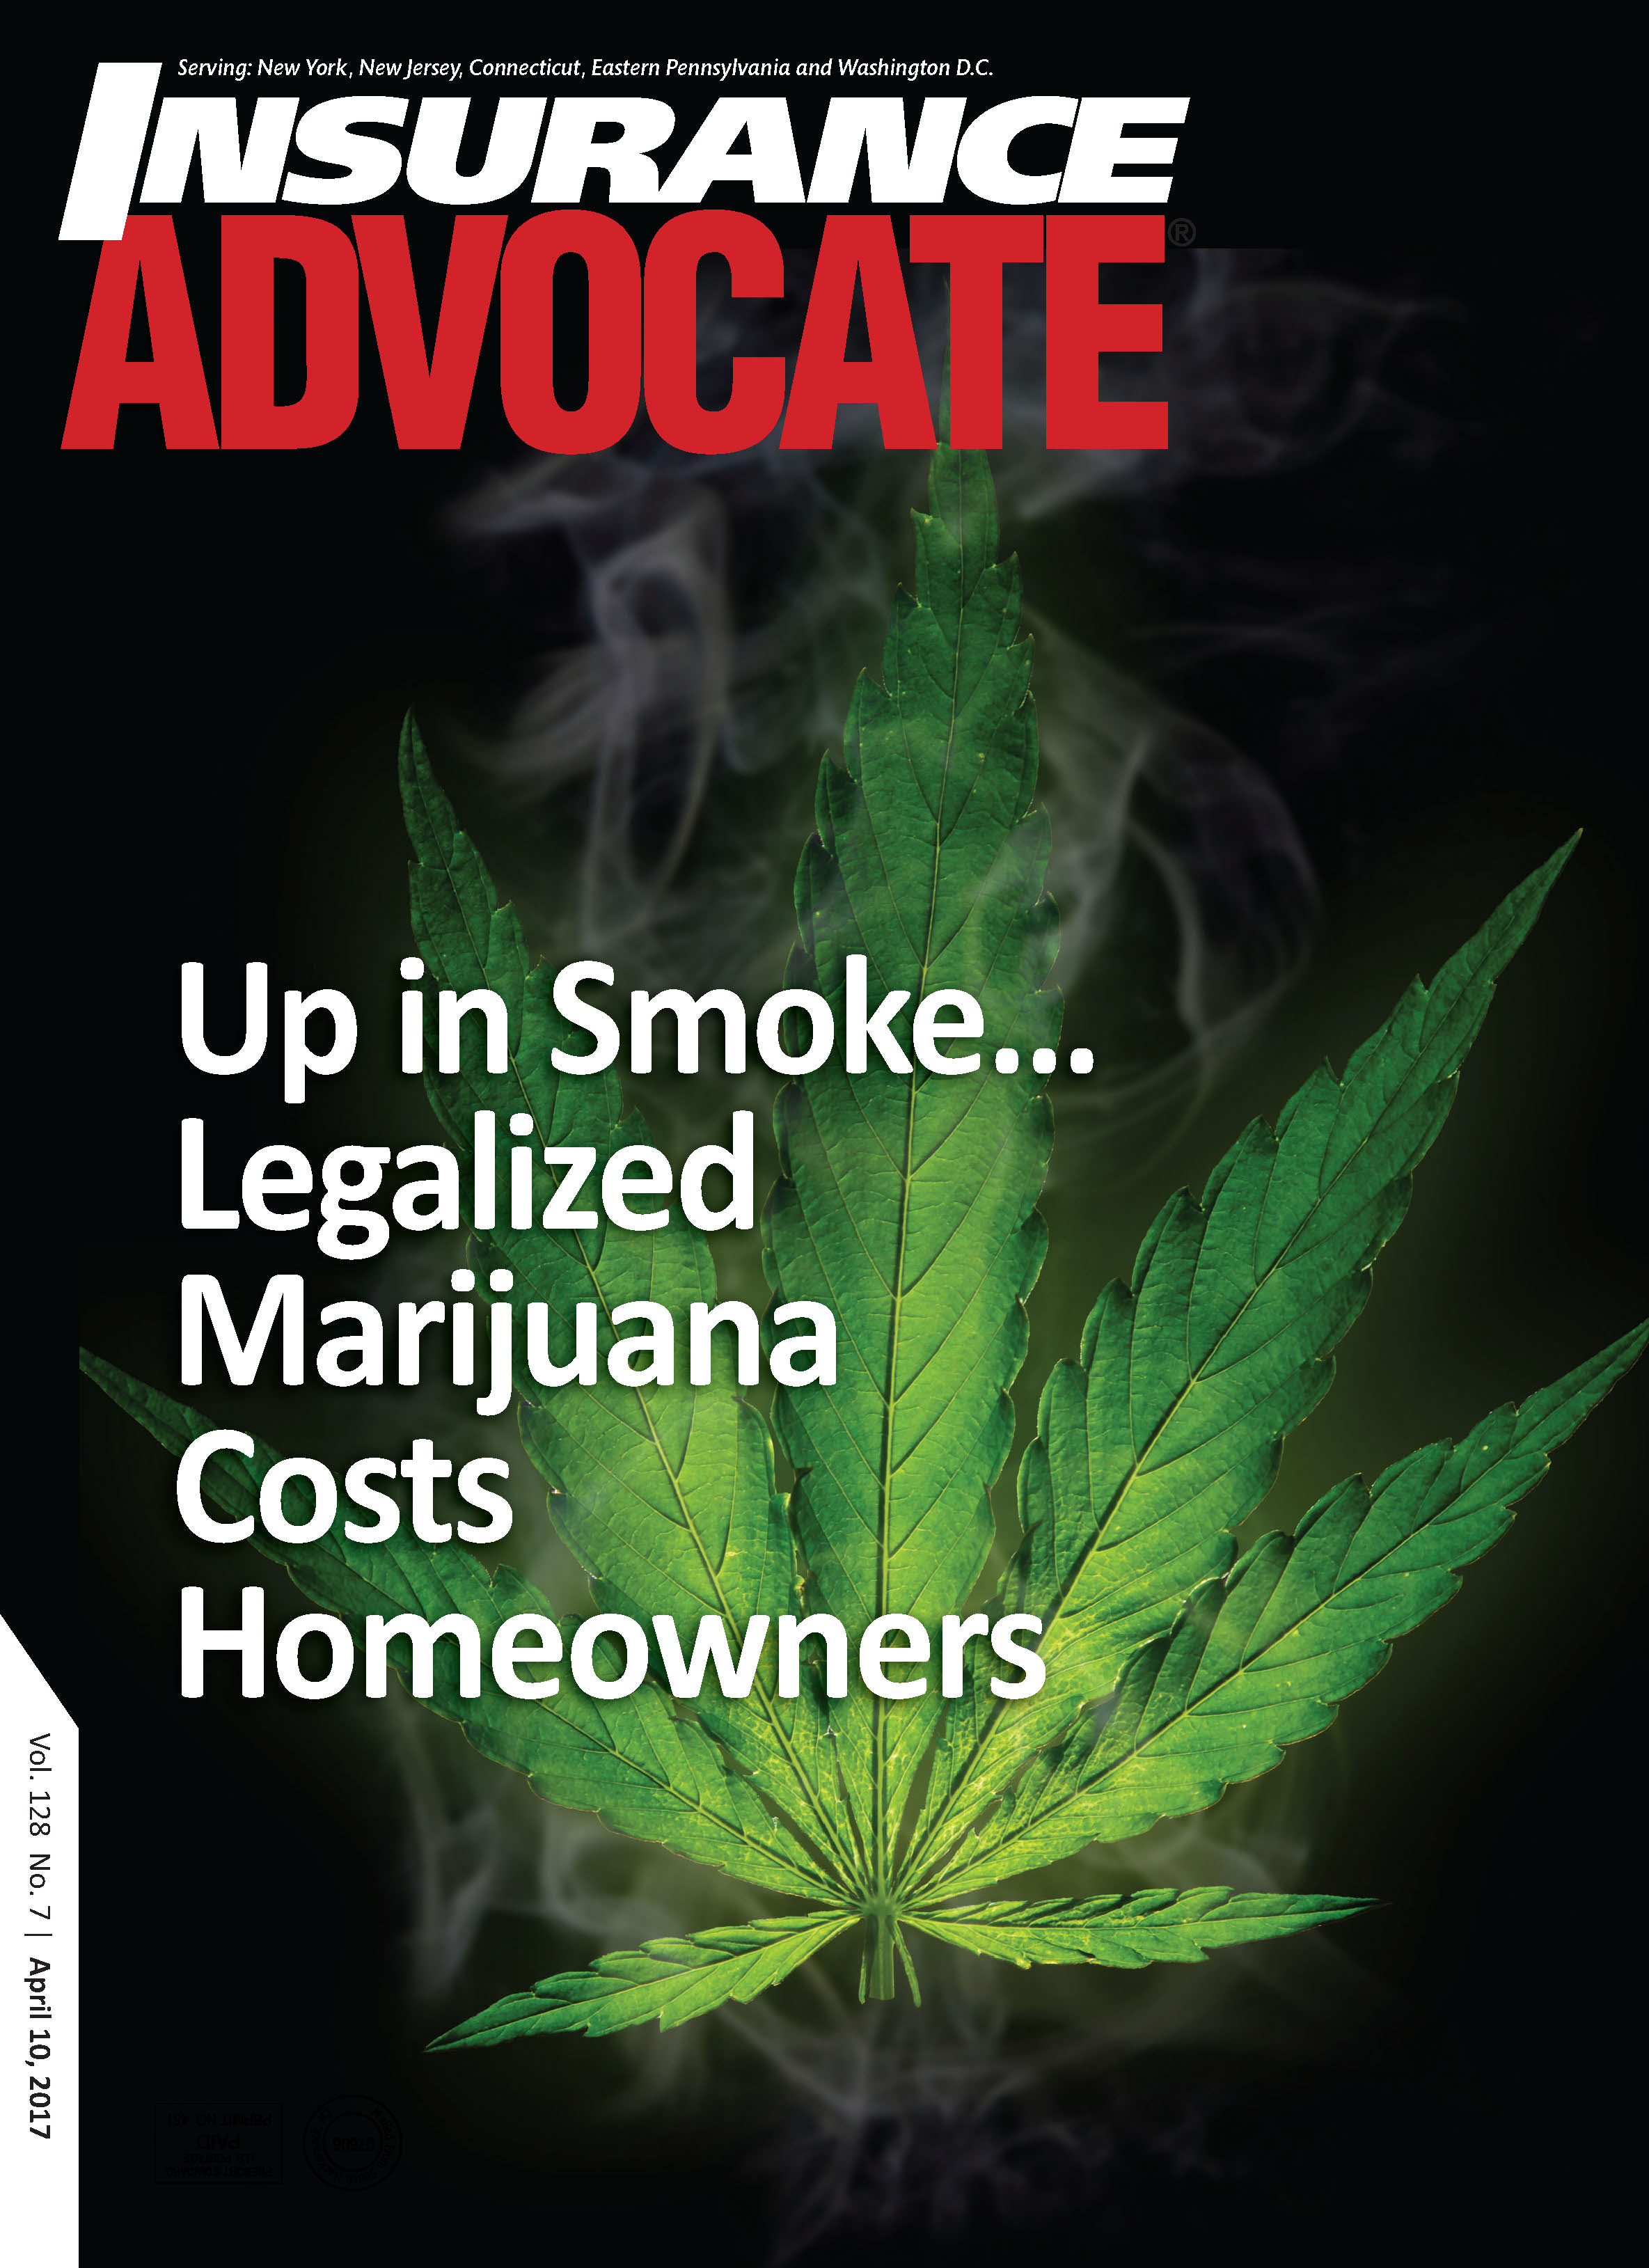 April 10, 2017 Cover